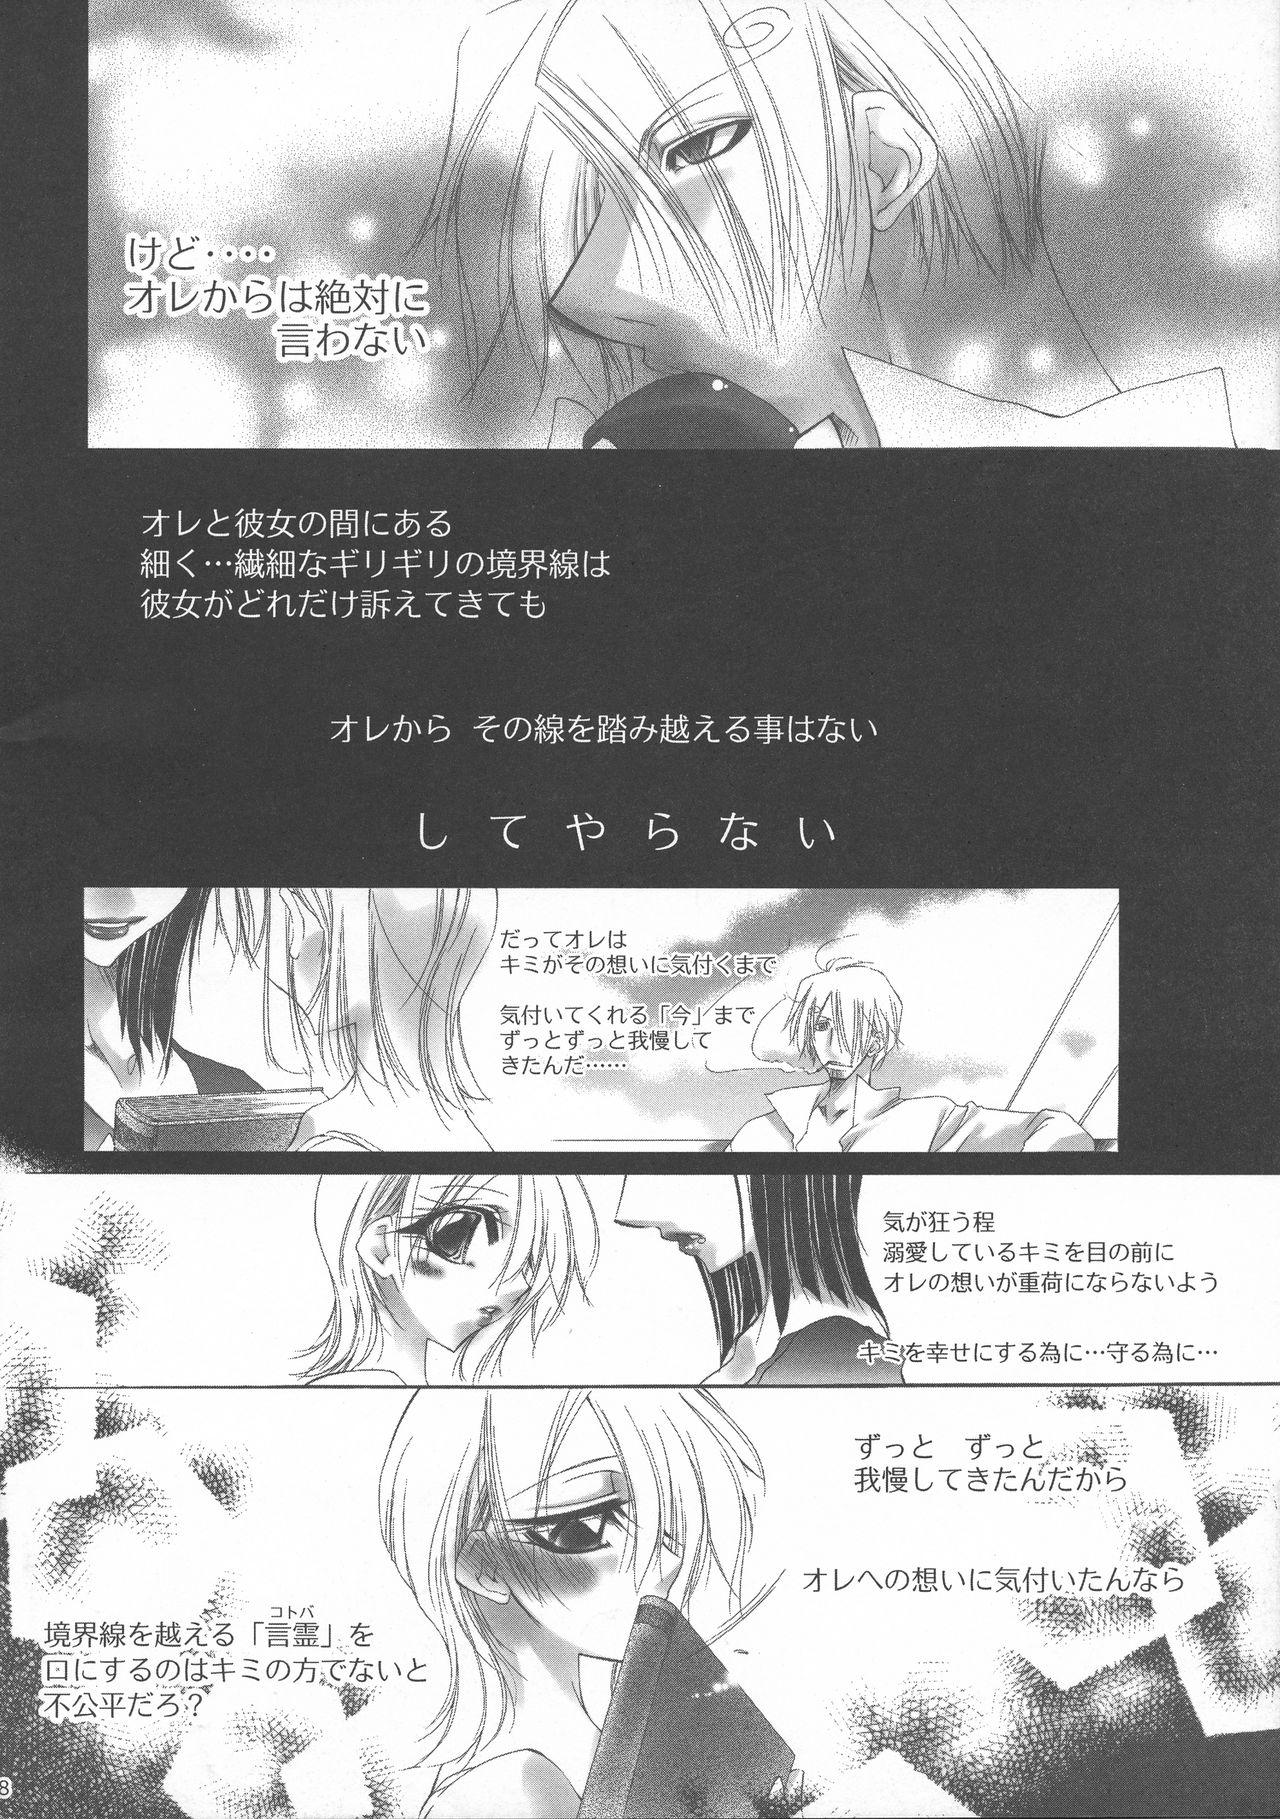 Futanari hime 7